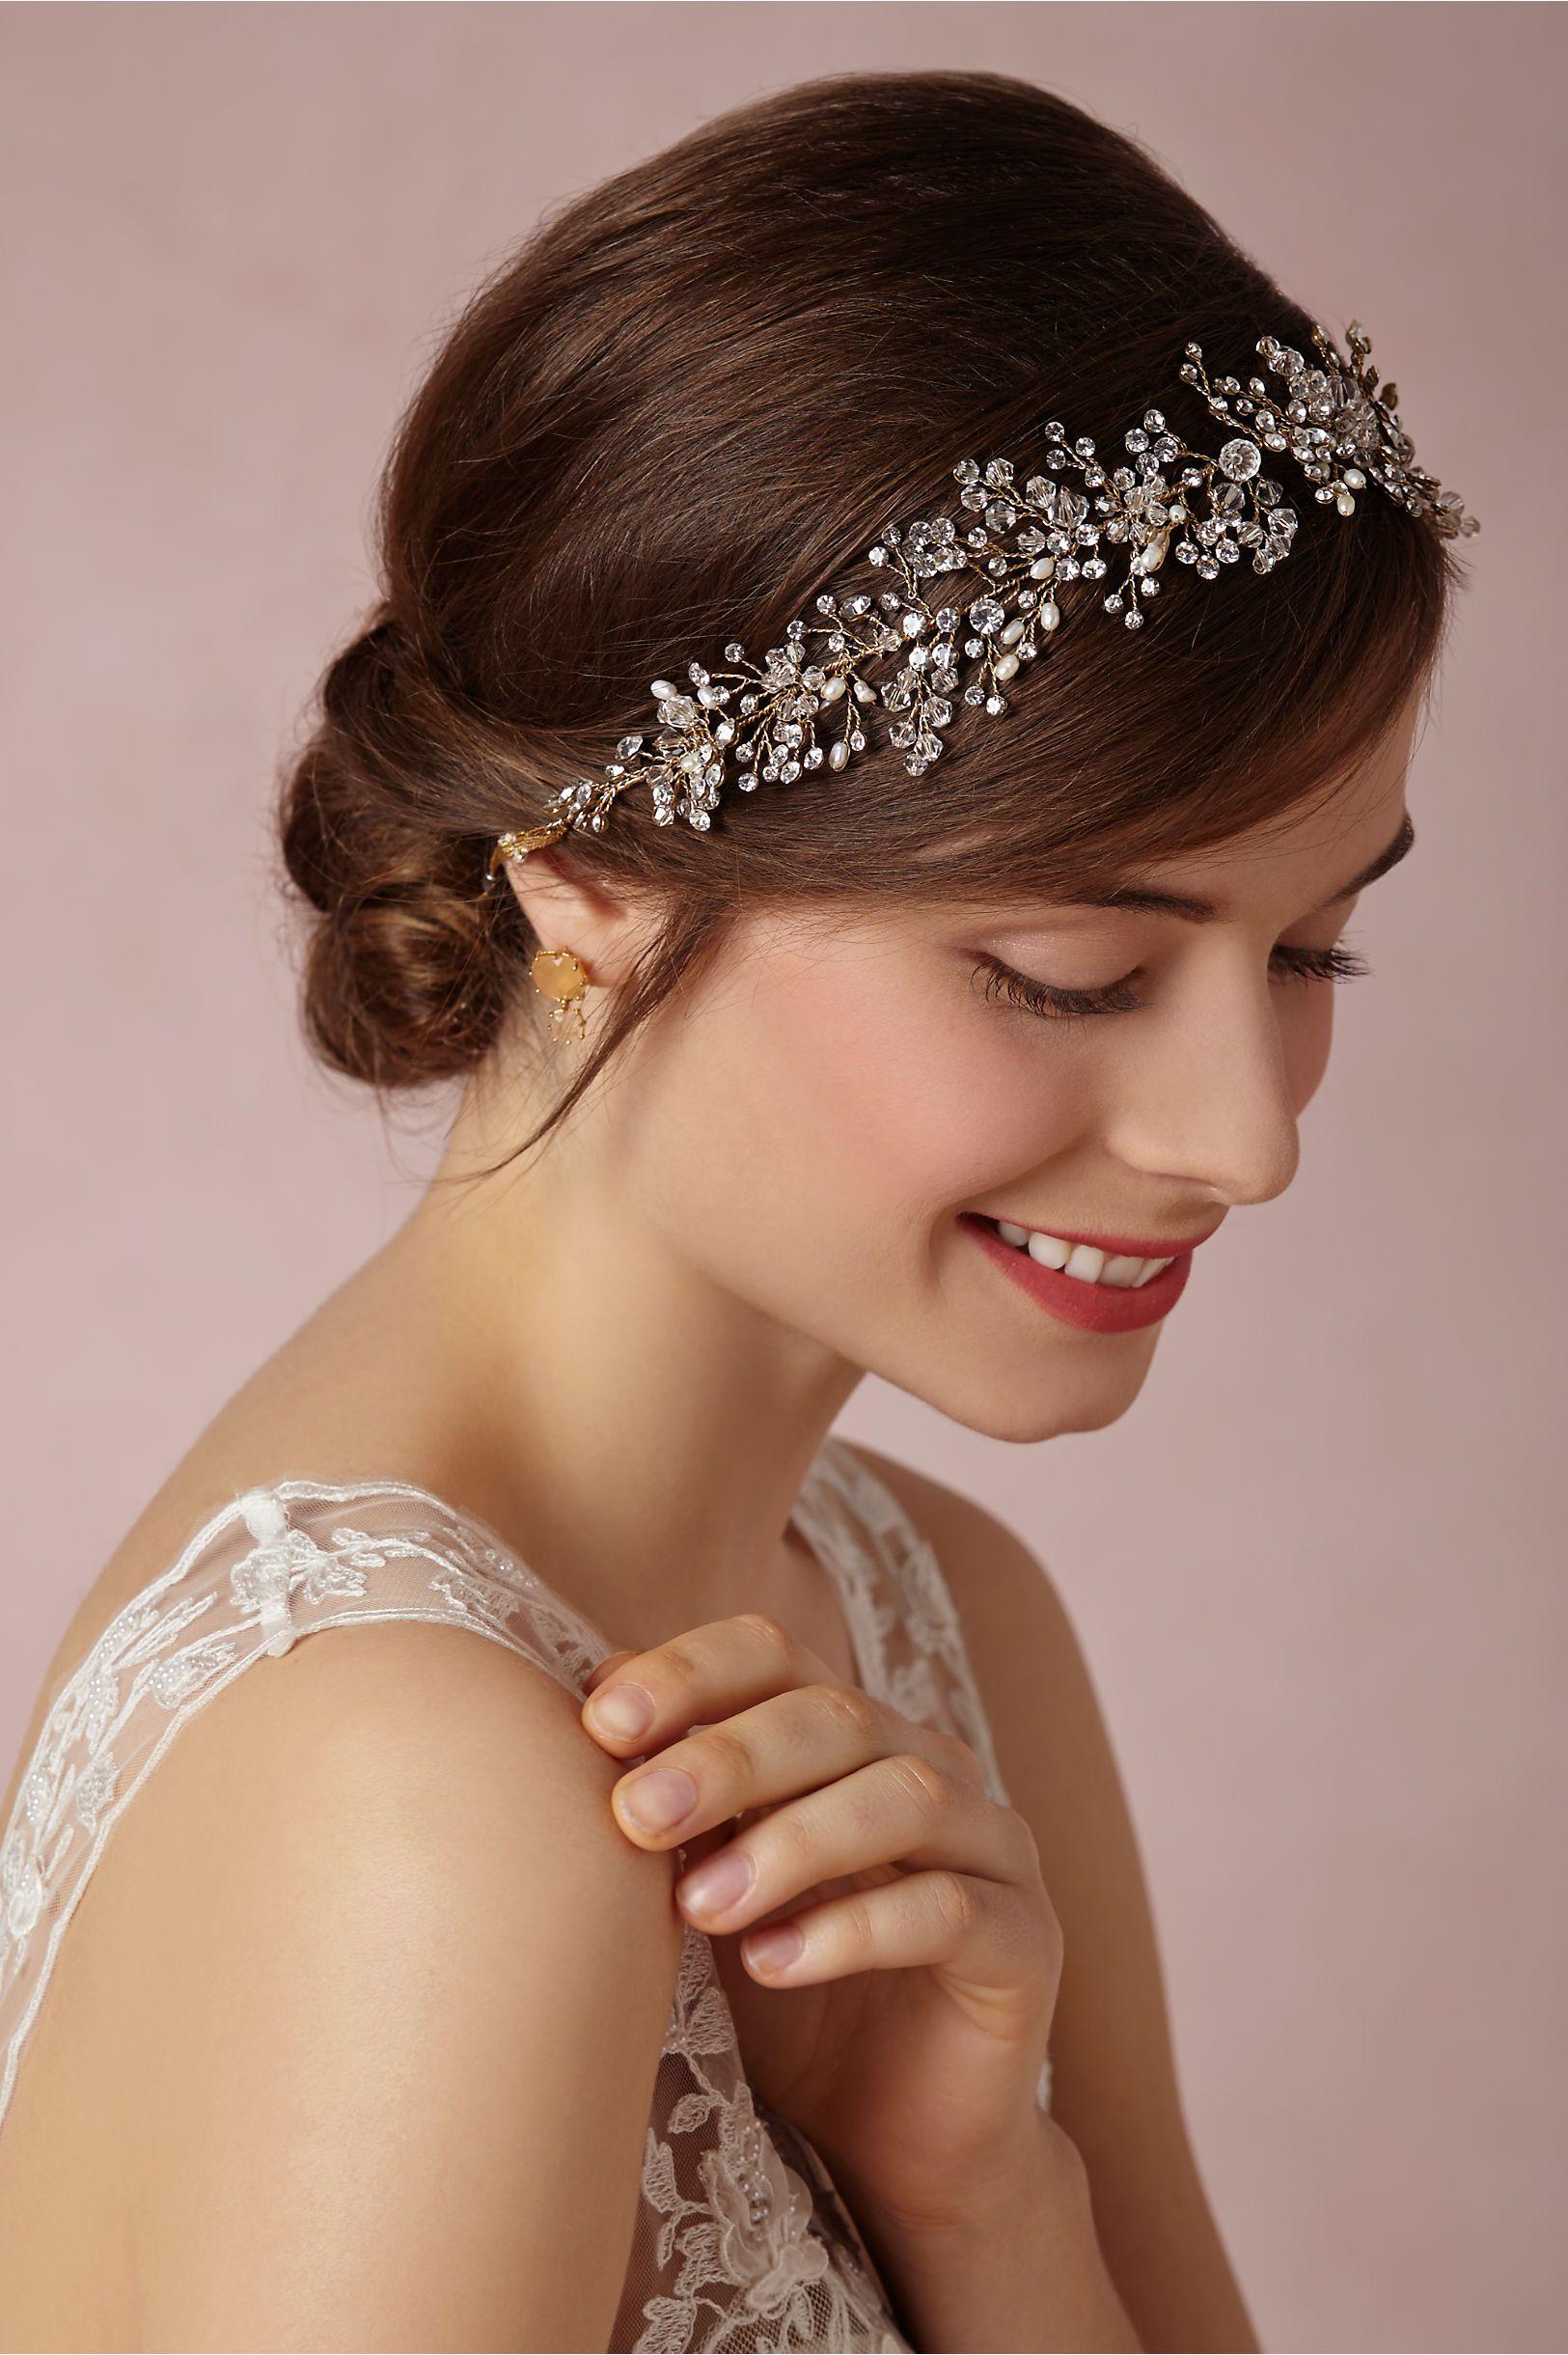 breathless headpiece: swarovski crystals, freshwater pearls, and